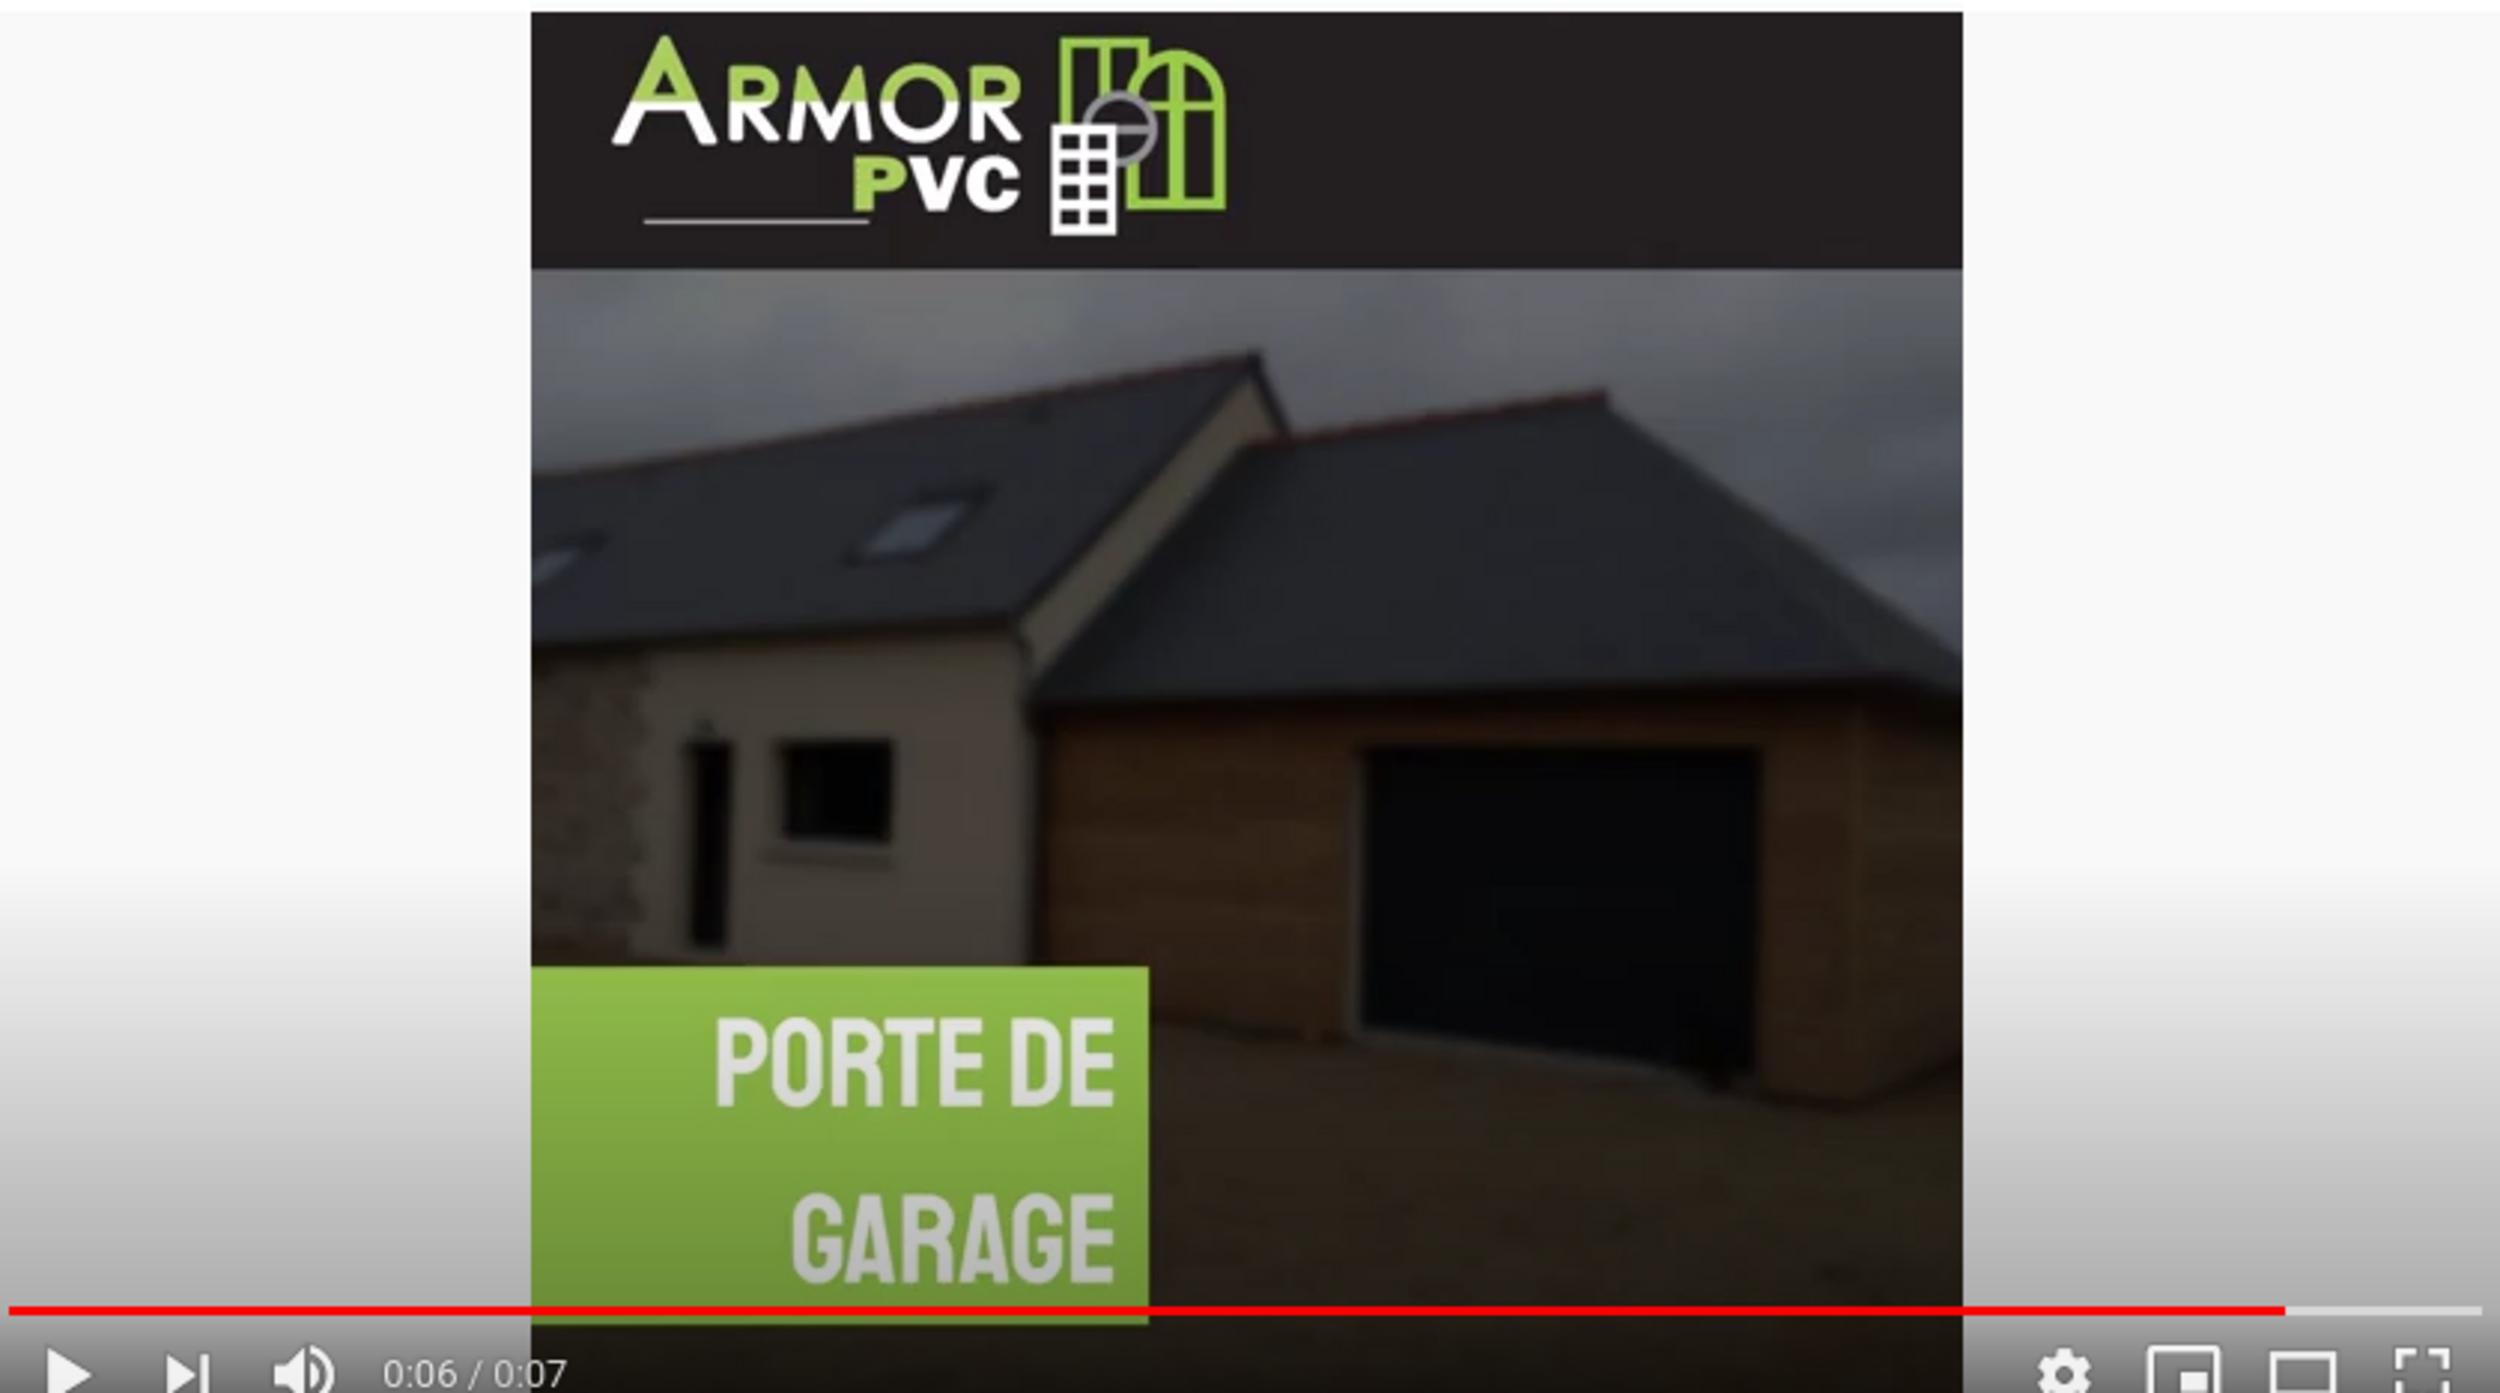 Armor PVC Porte de Garage